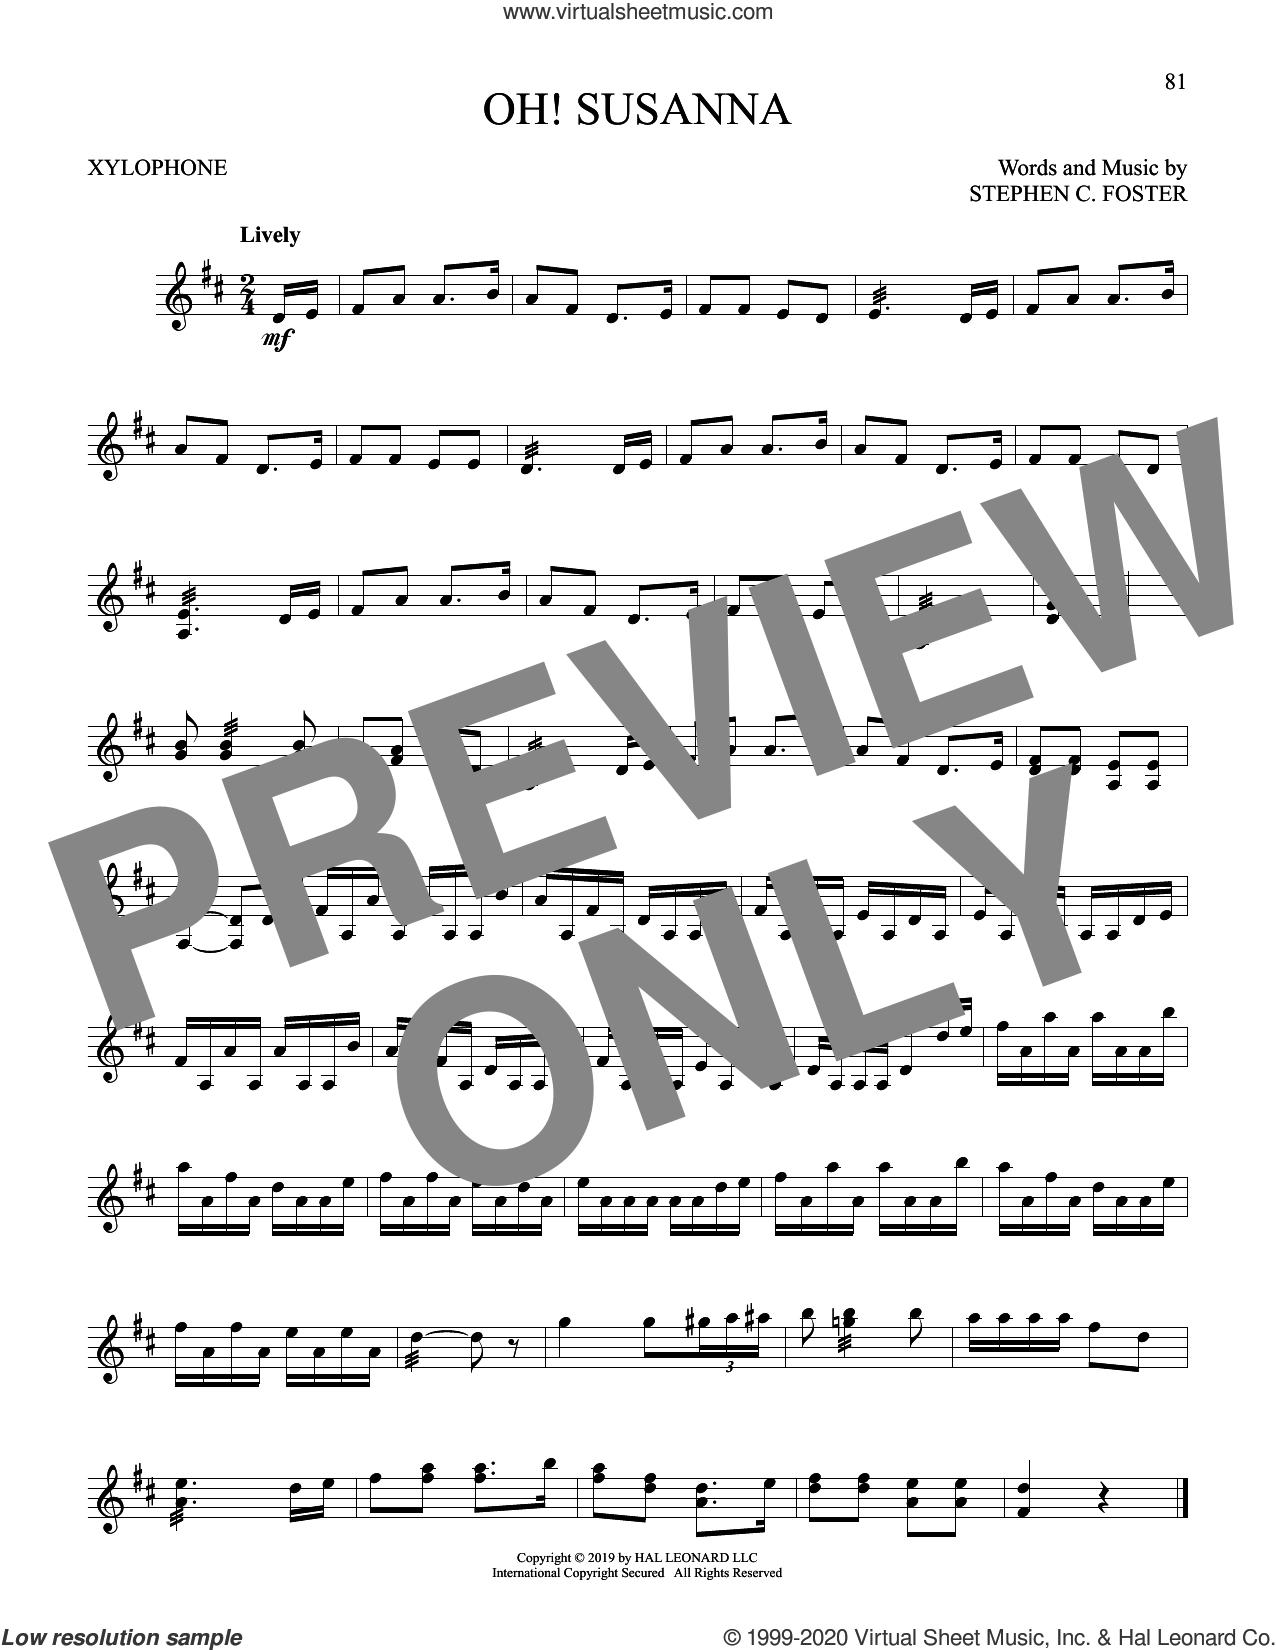 Oh! Susanna sheet music for Xylophone Solo (xilofone, xilofono, silofono) by Stephen Foster, intermediate skill level